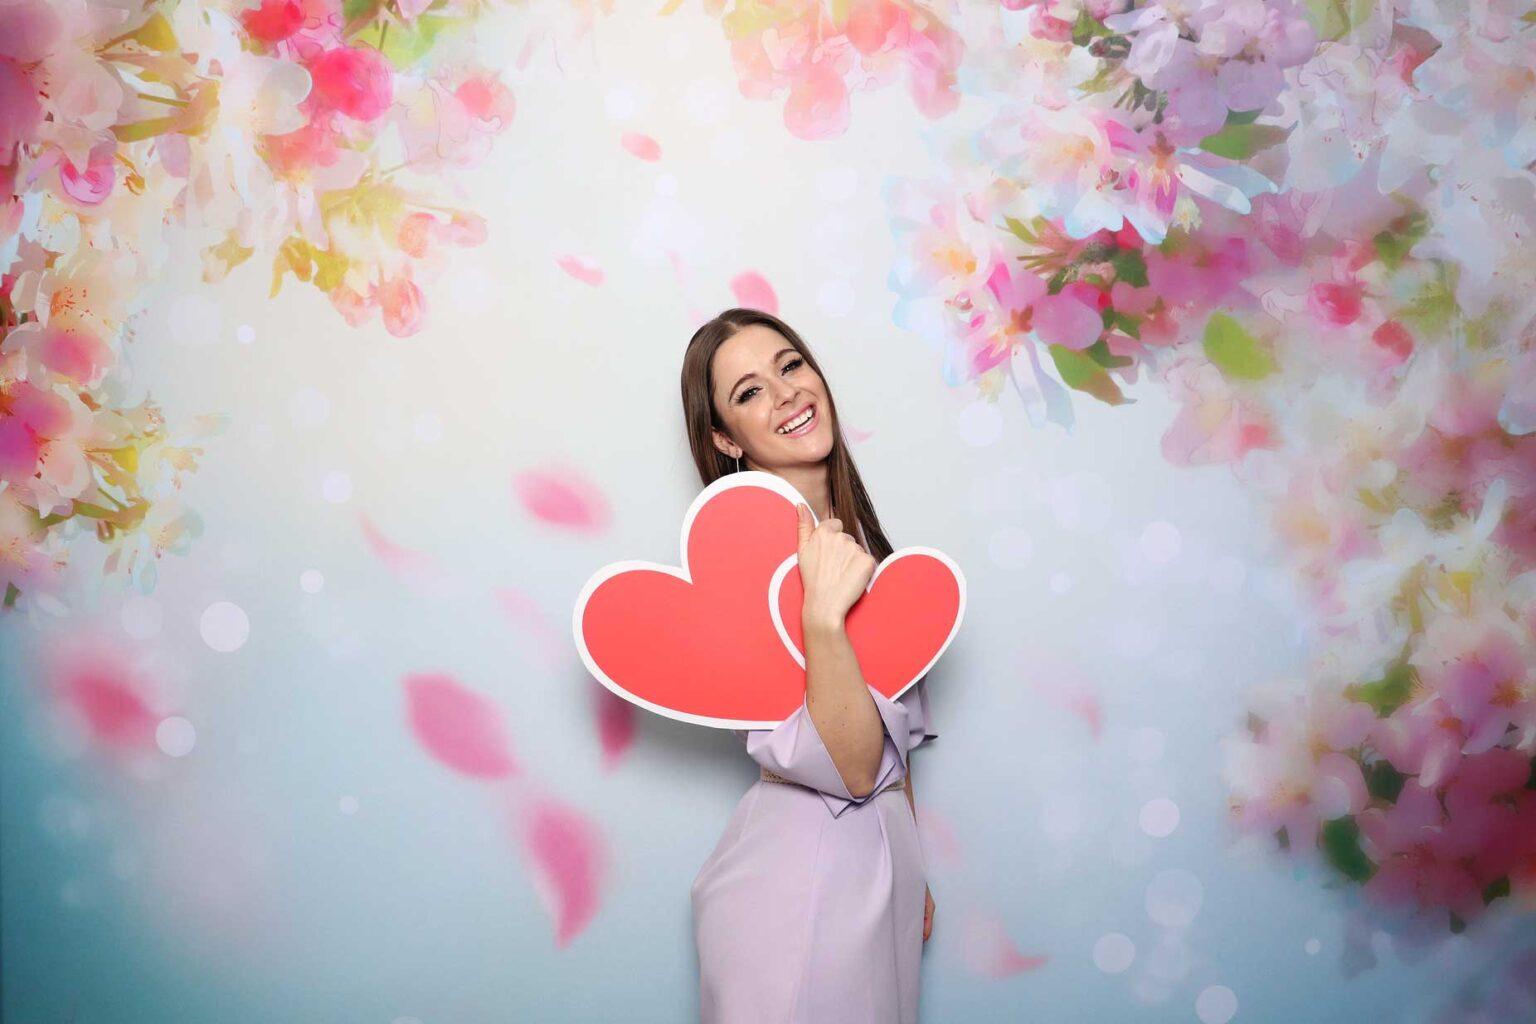 fotostena cherry blossom fotokutik FOTOKÚTIK.sk